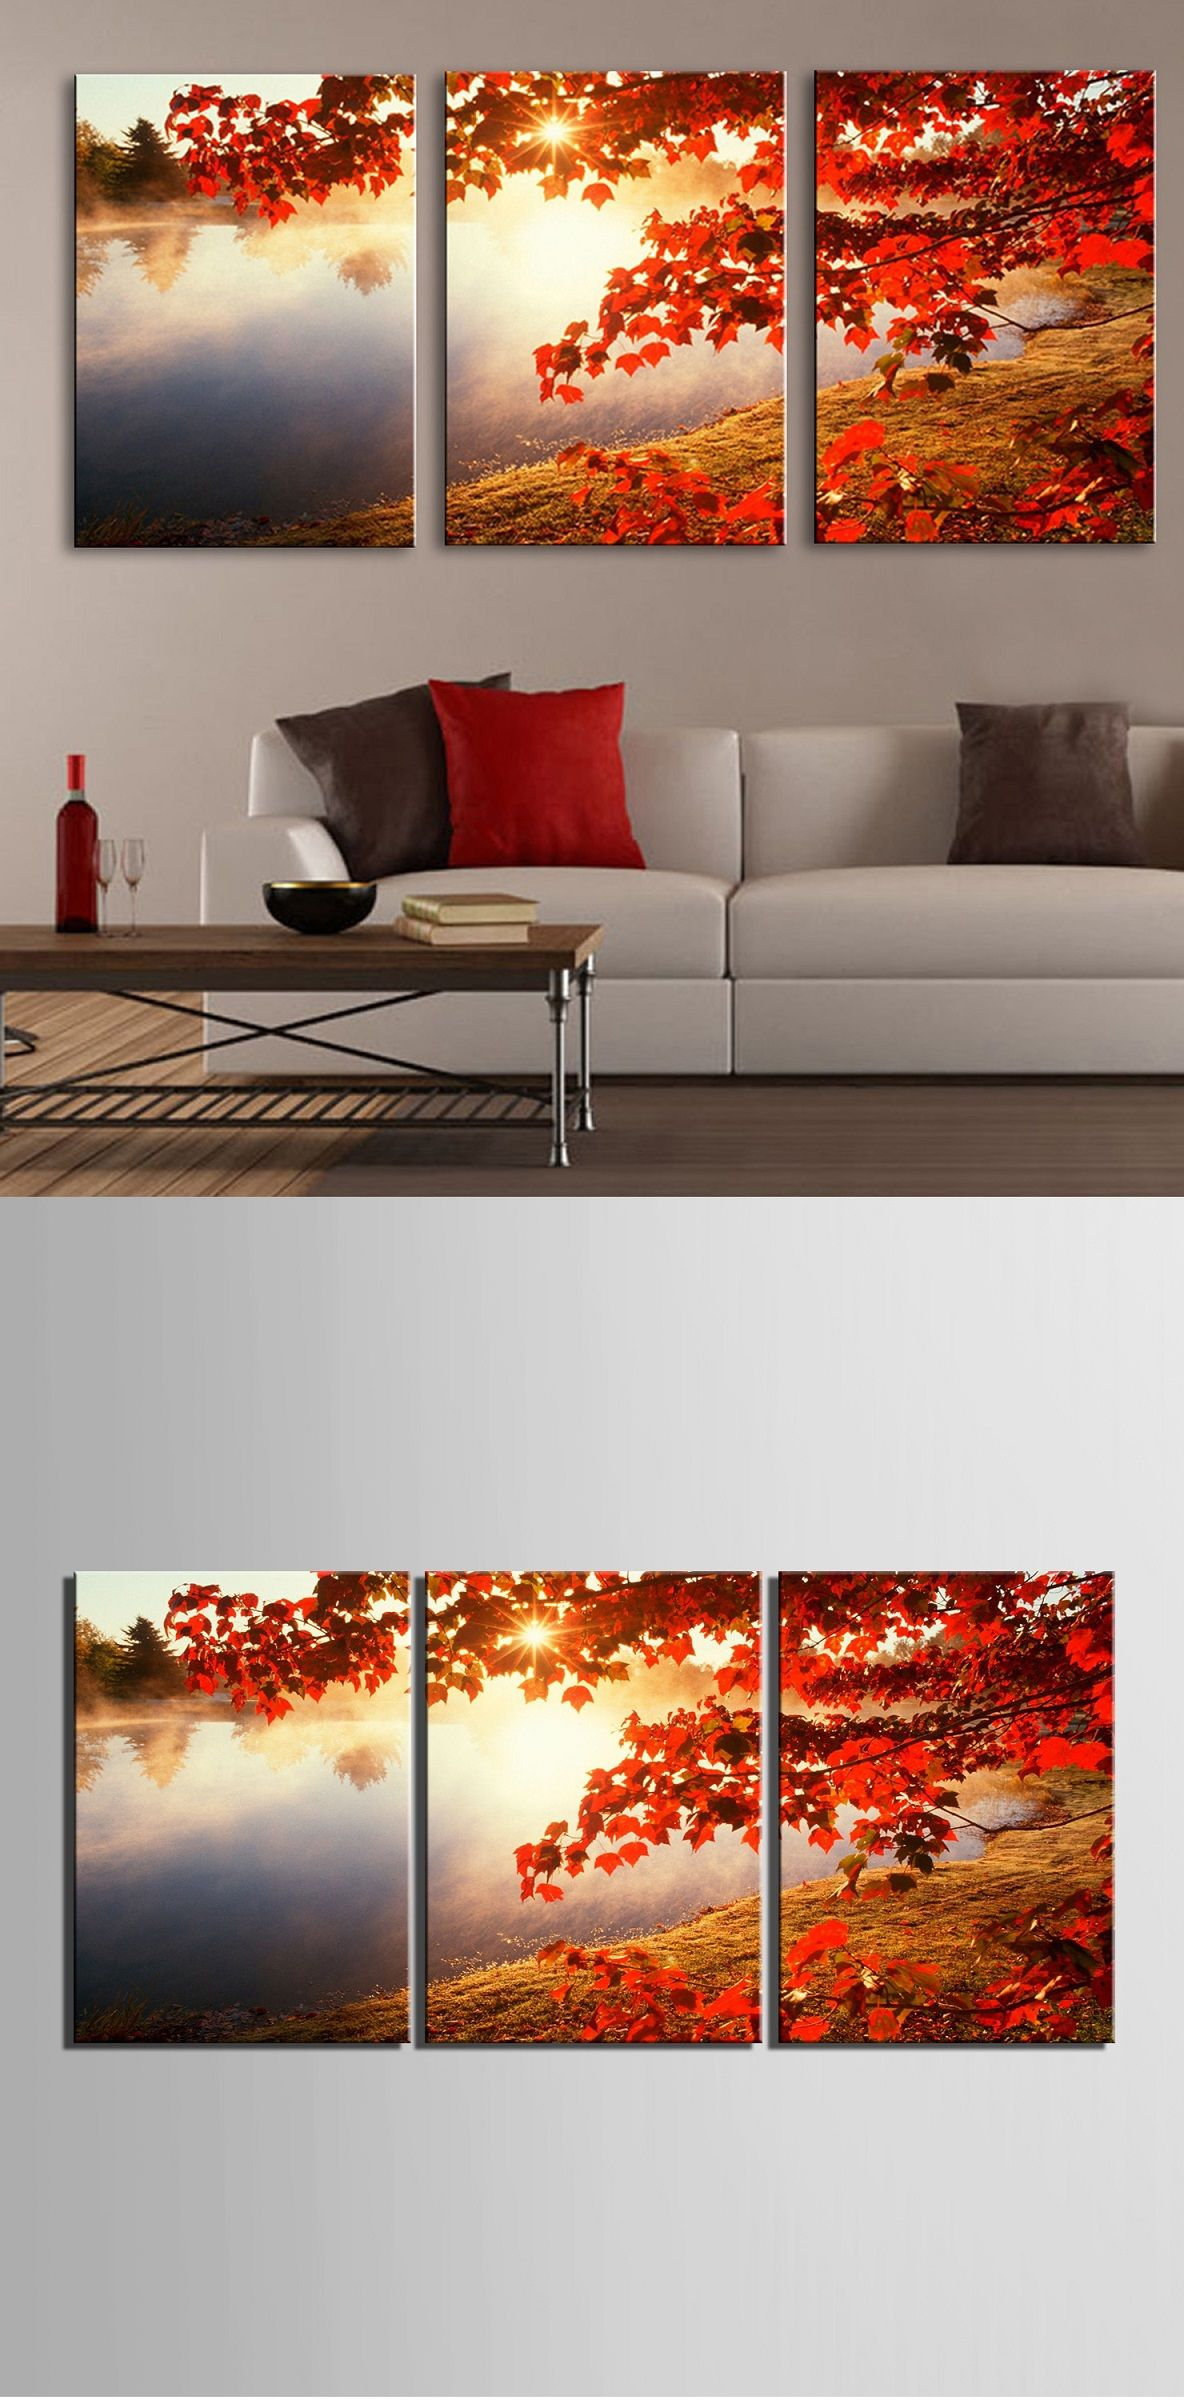 Qu te parece este cuadro para decorar tu sala Encuentralo aqu